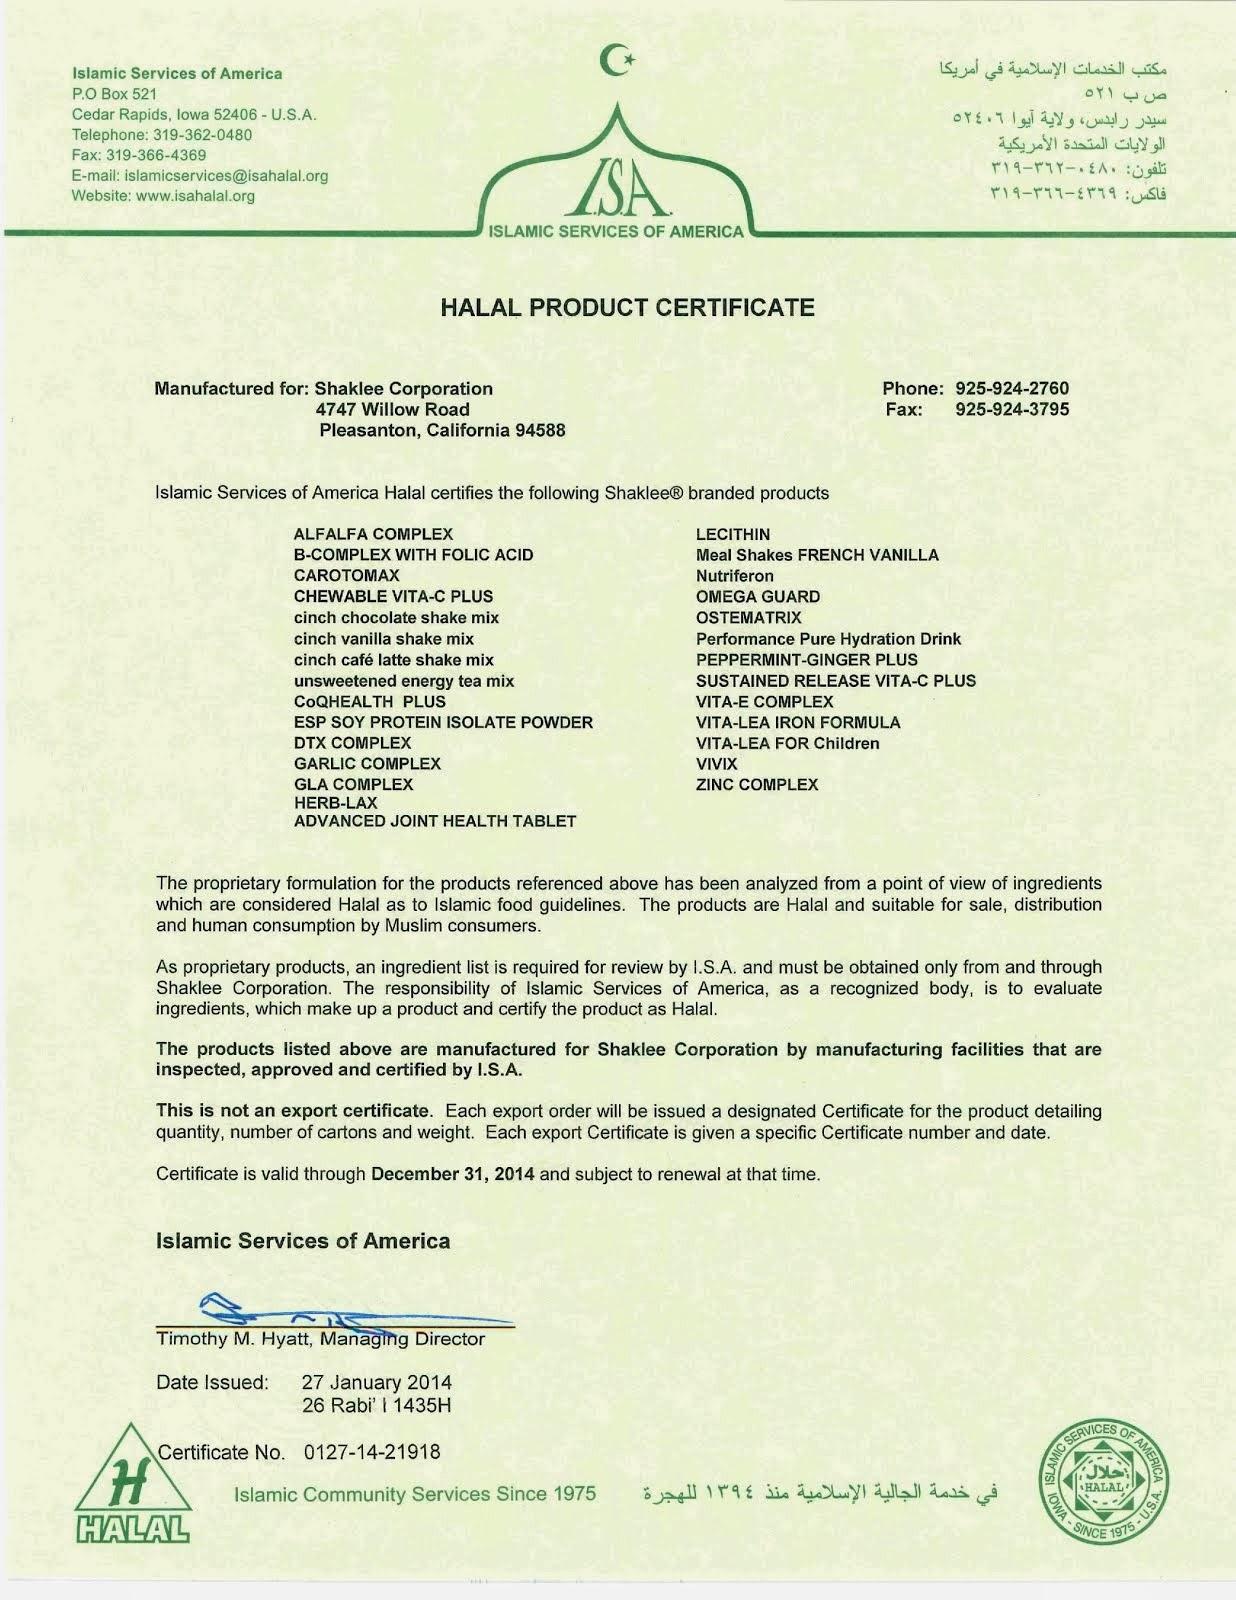 Certificate of Halal